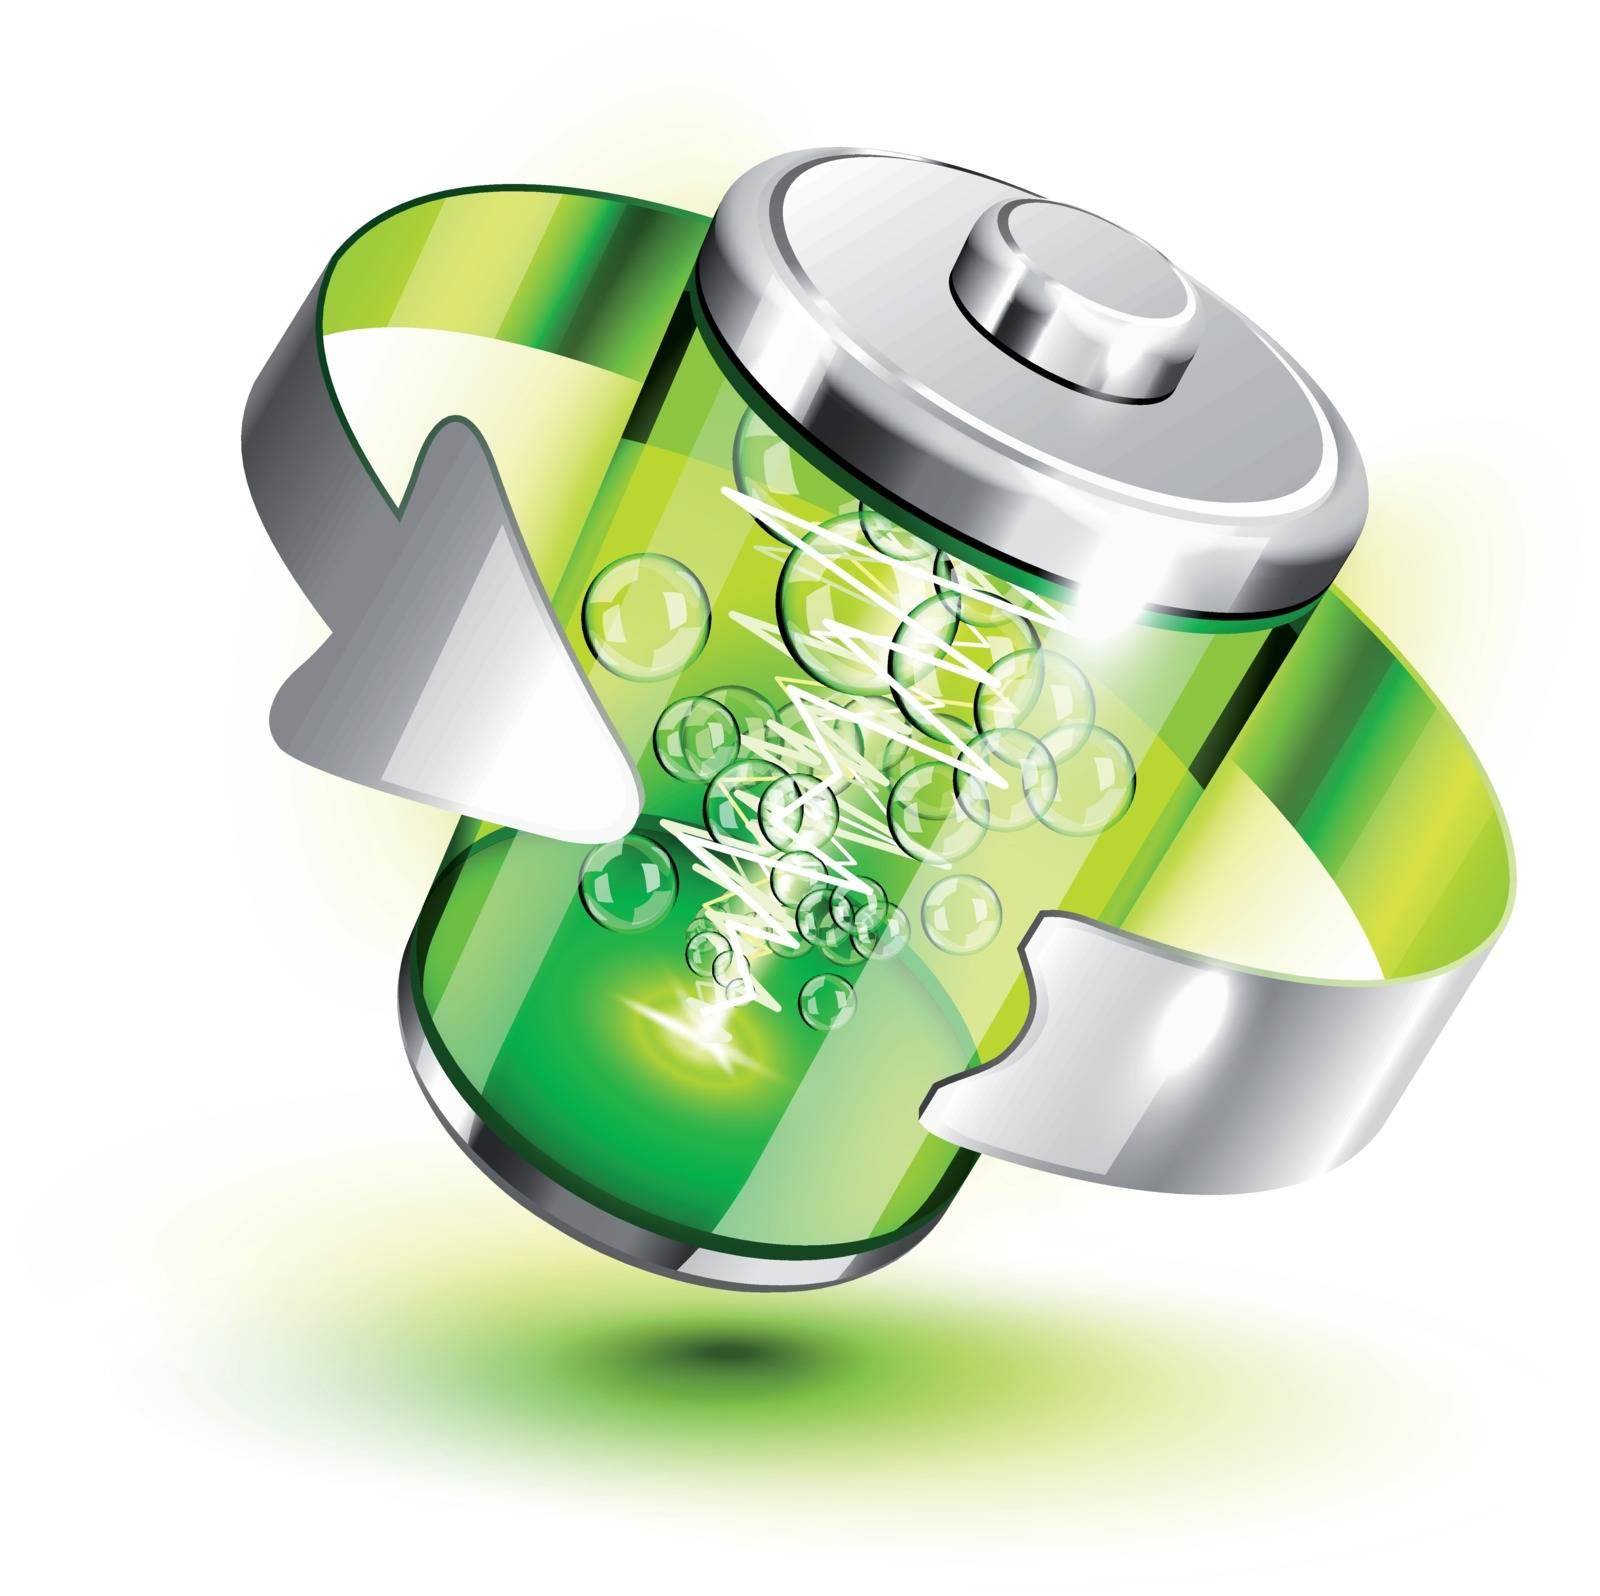 Green battery full level indicator icon